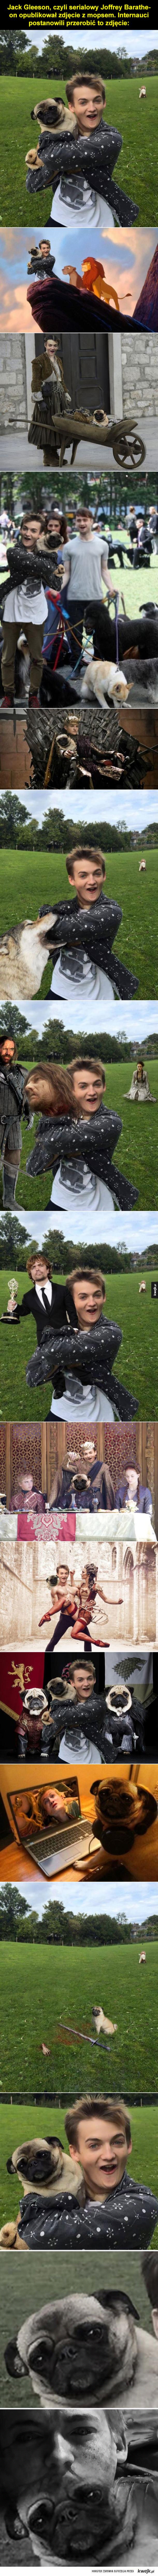 Joffrey i mops kontra Photoshop